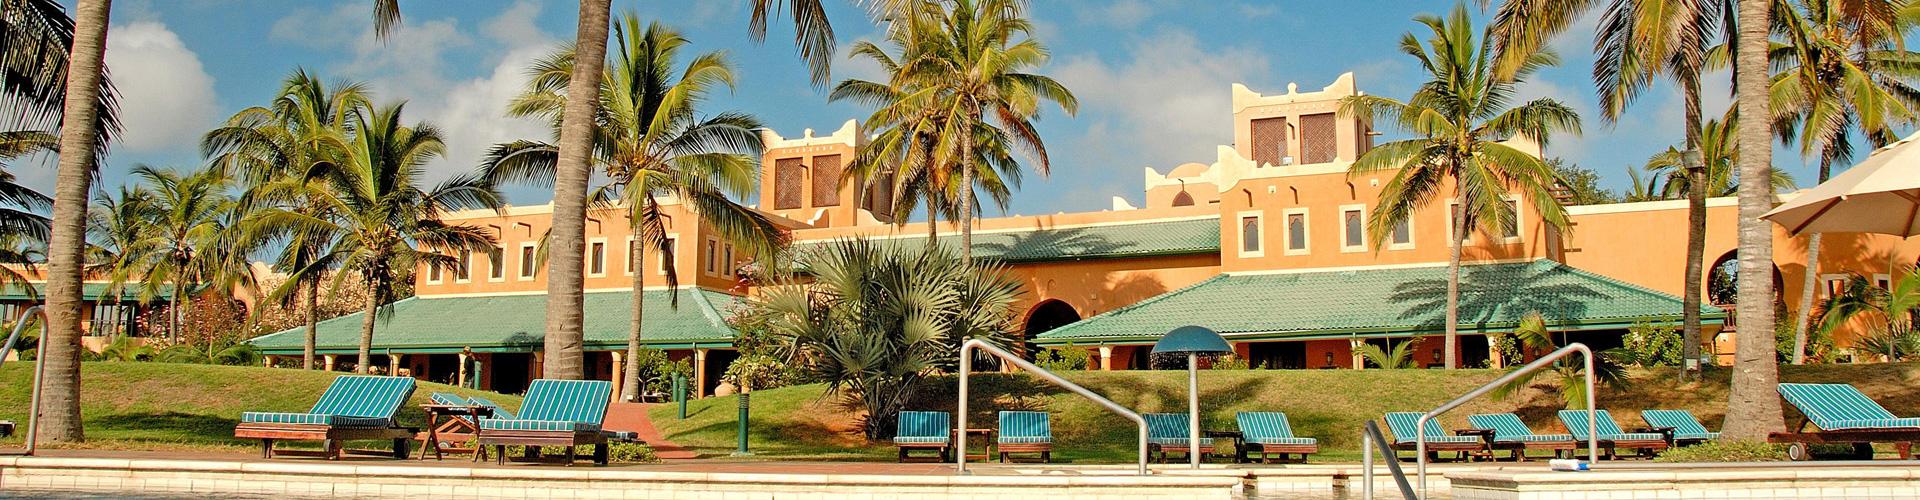 Pemba Beach Hotel & Spa